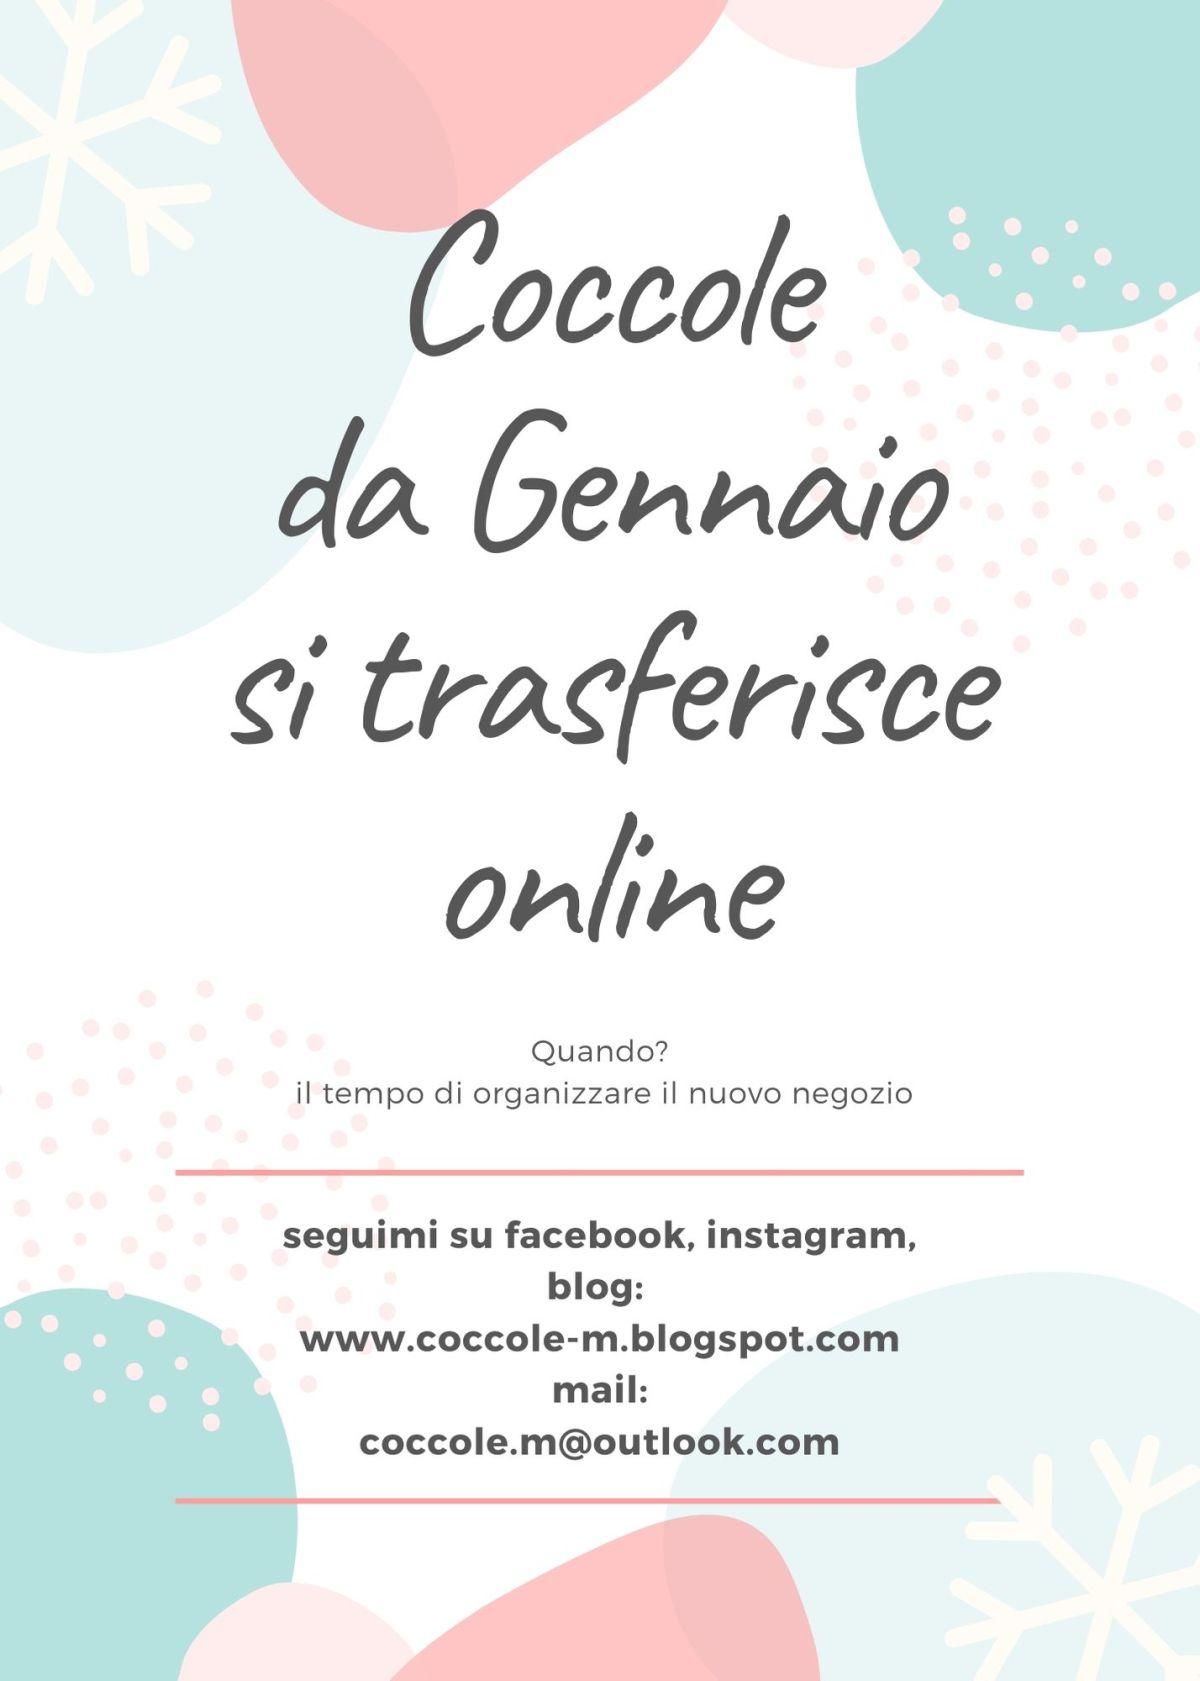 locandina coccole online